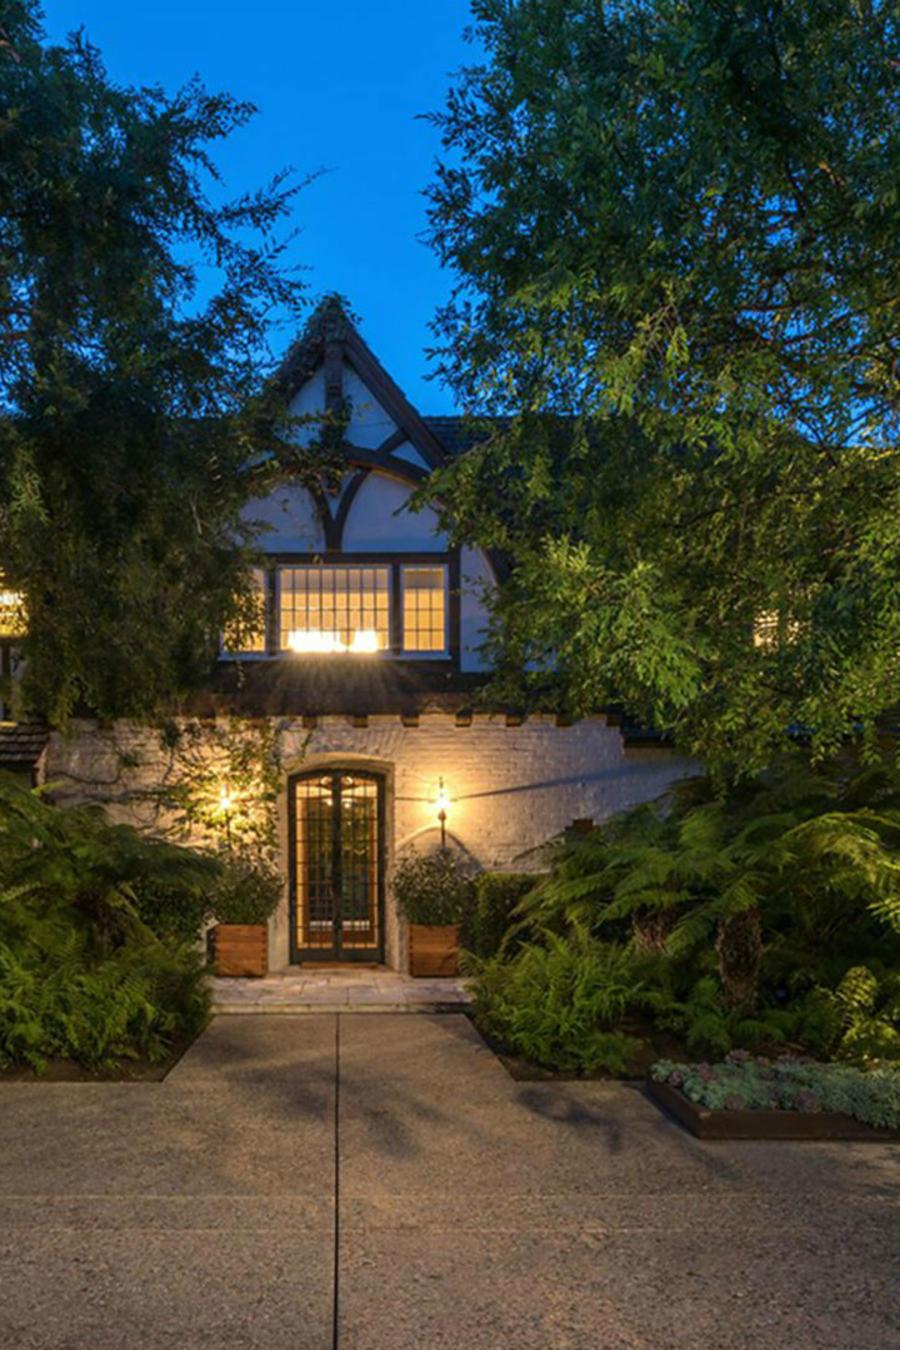 Casa de Jennifer Aniston y Brad Pitt